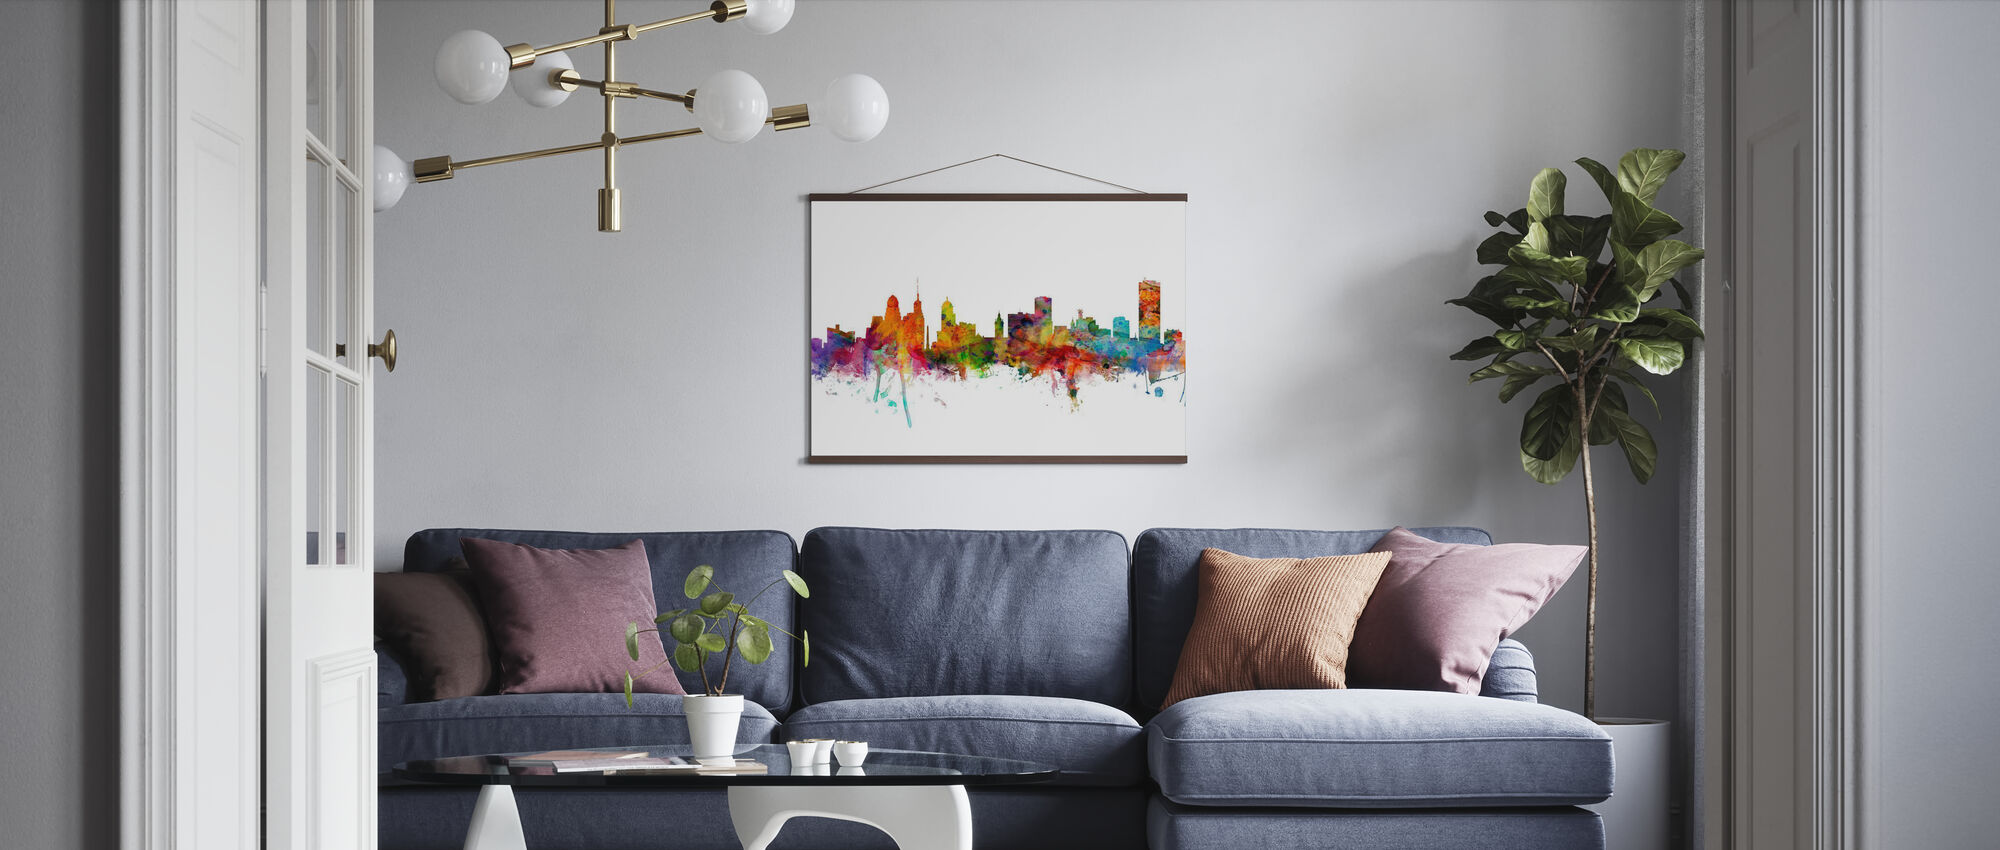 Skyline van Buffalo New York - Poster - Woonkamer